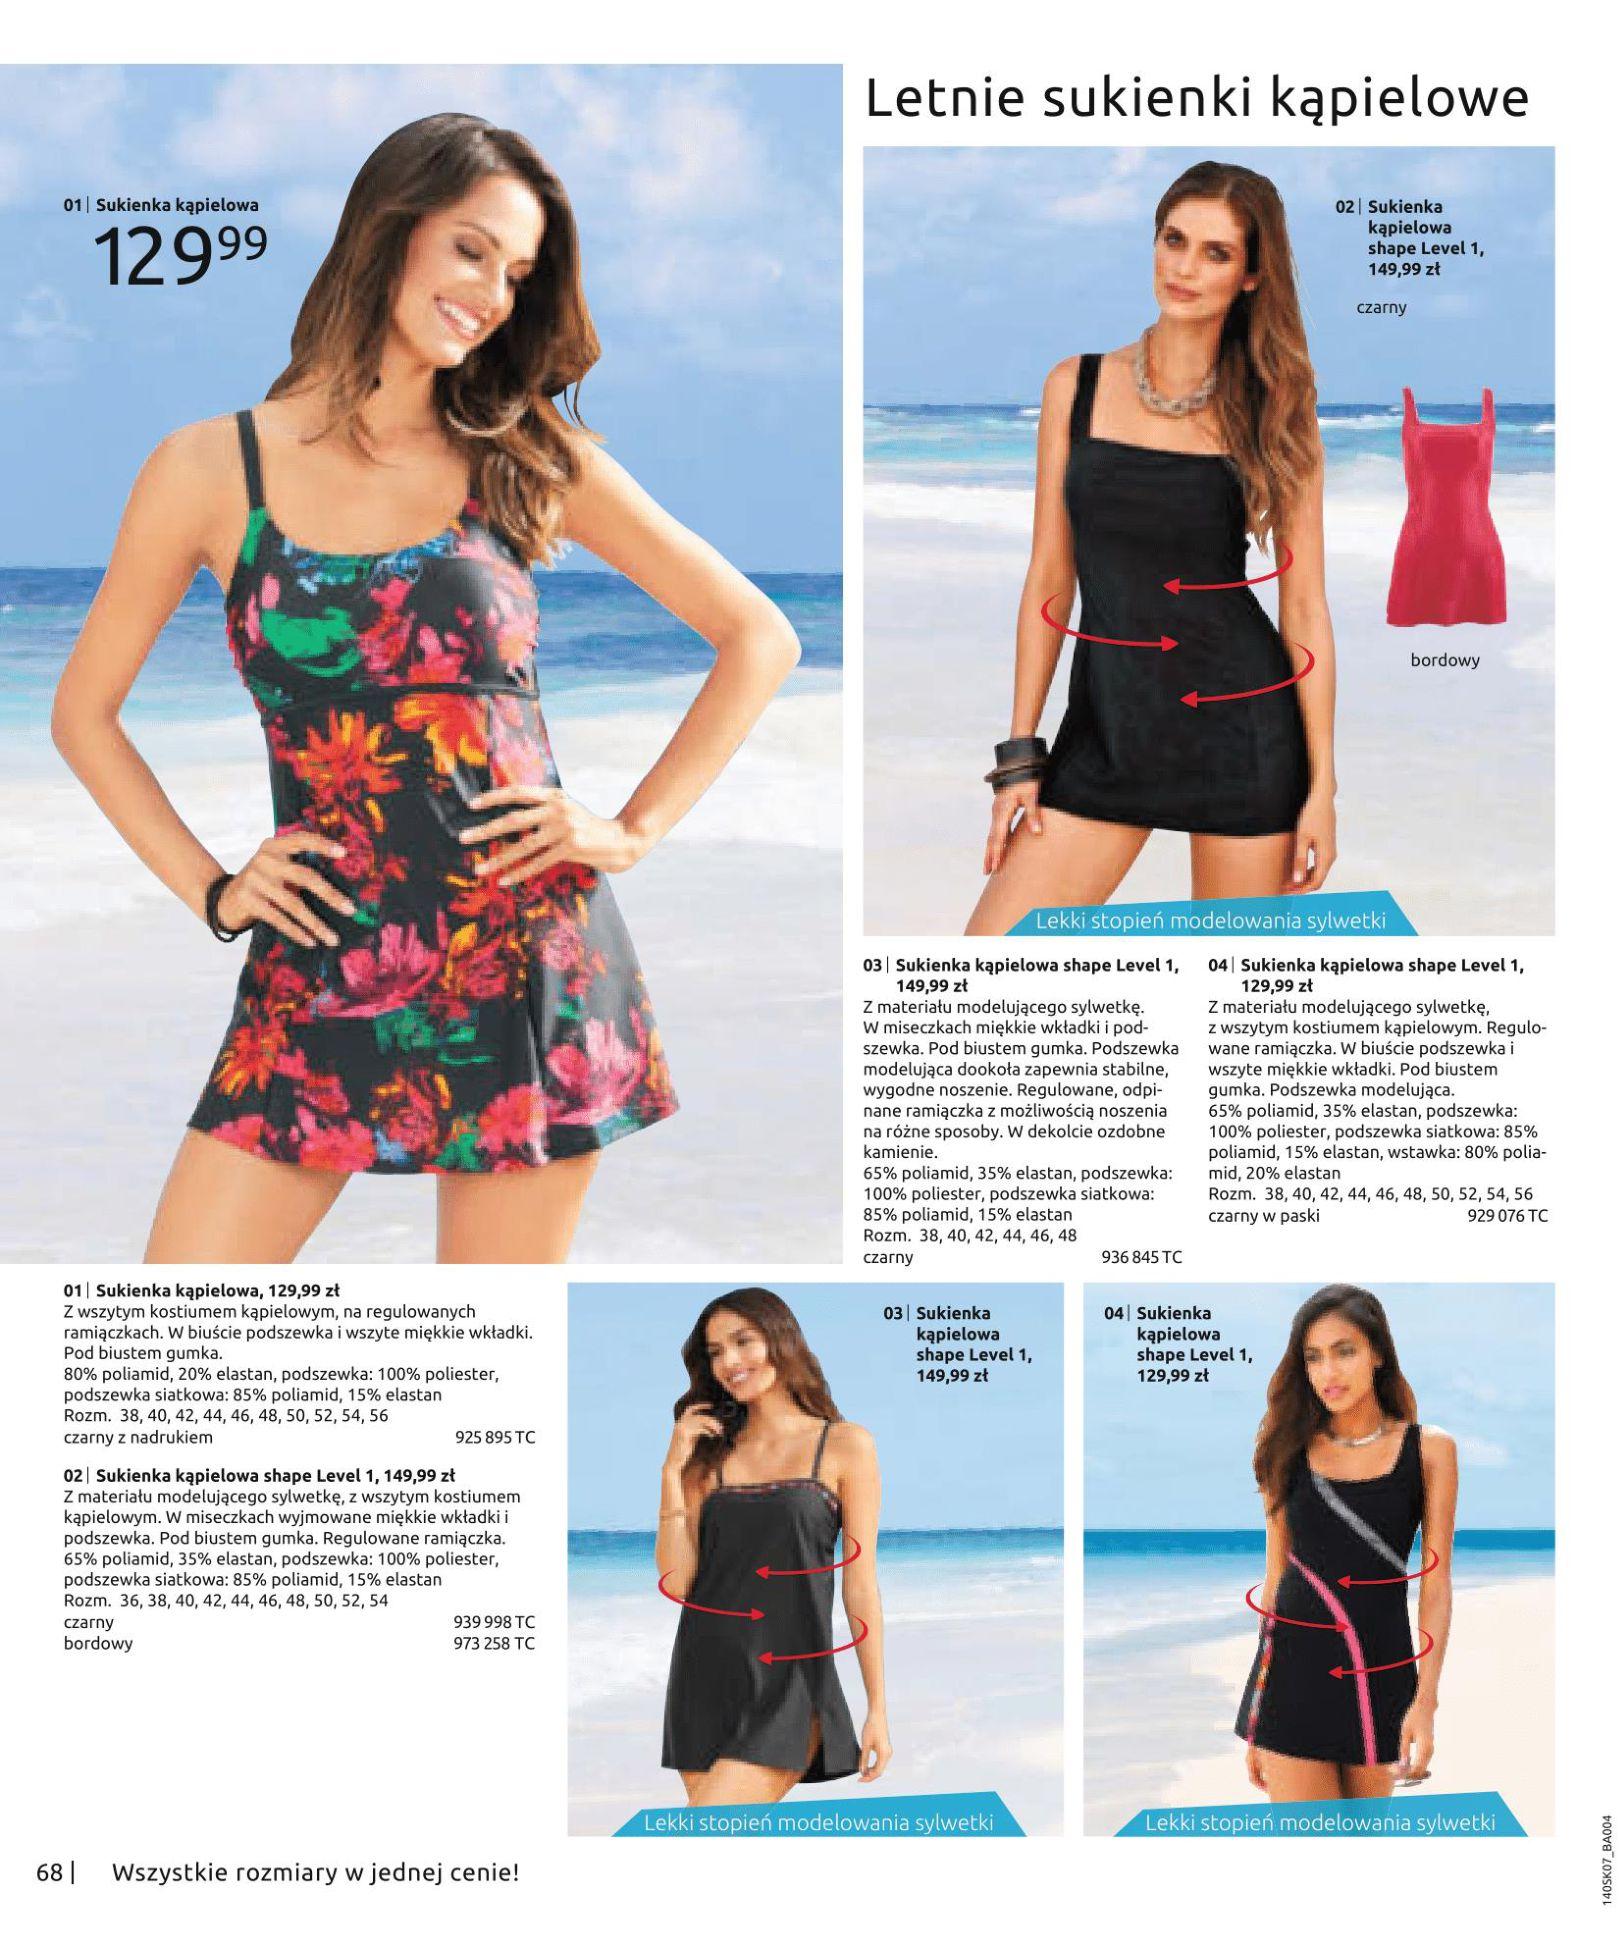 Gazetka Bonprix - Letnie trendy-02.07.2019-15.01.2020-page-70